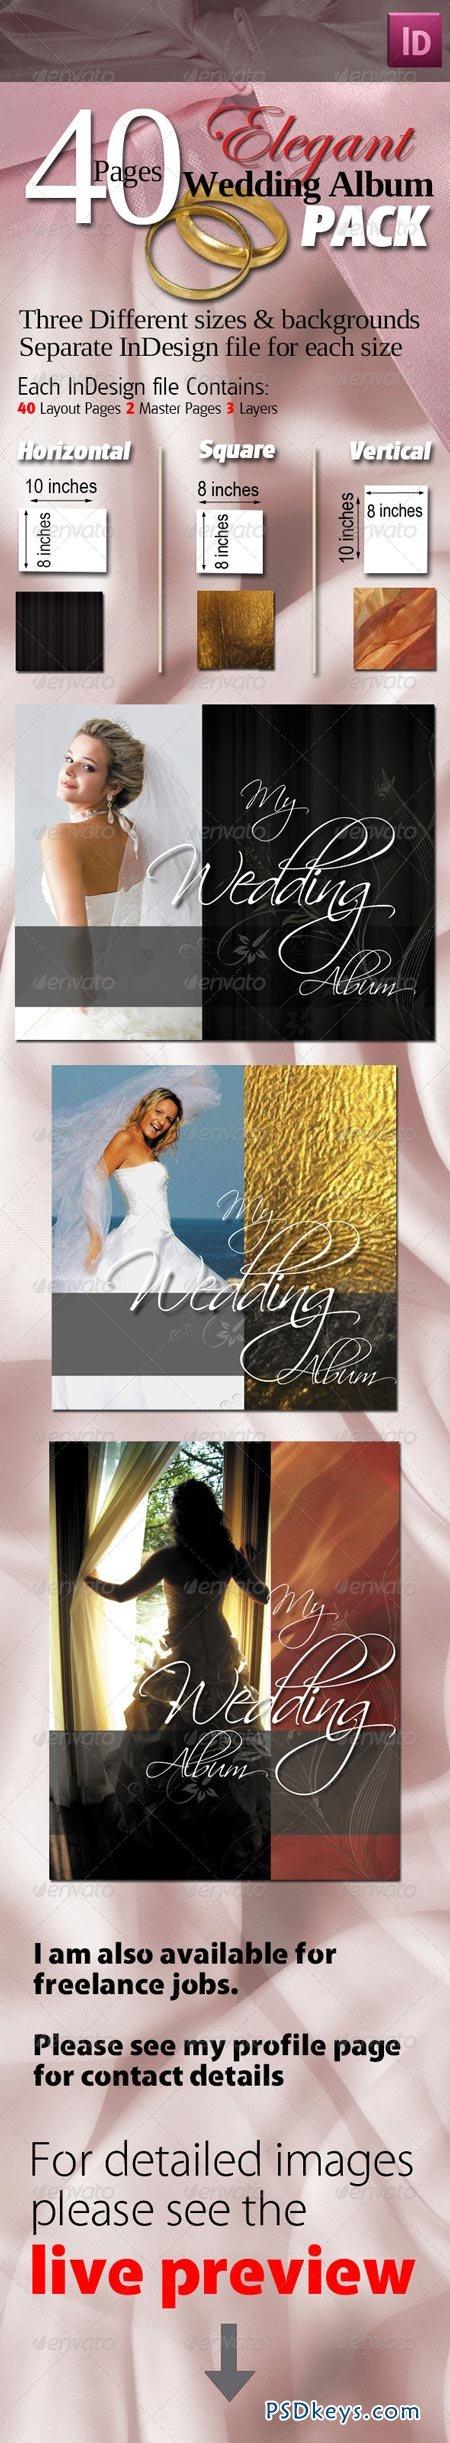 40 Pages Elegant Wedding Albums Pack 551474